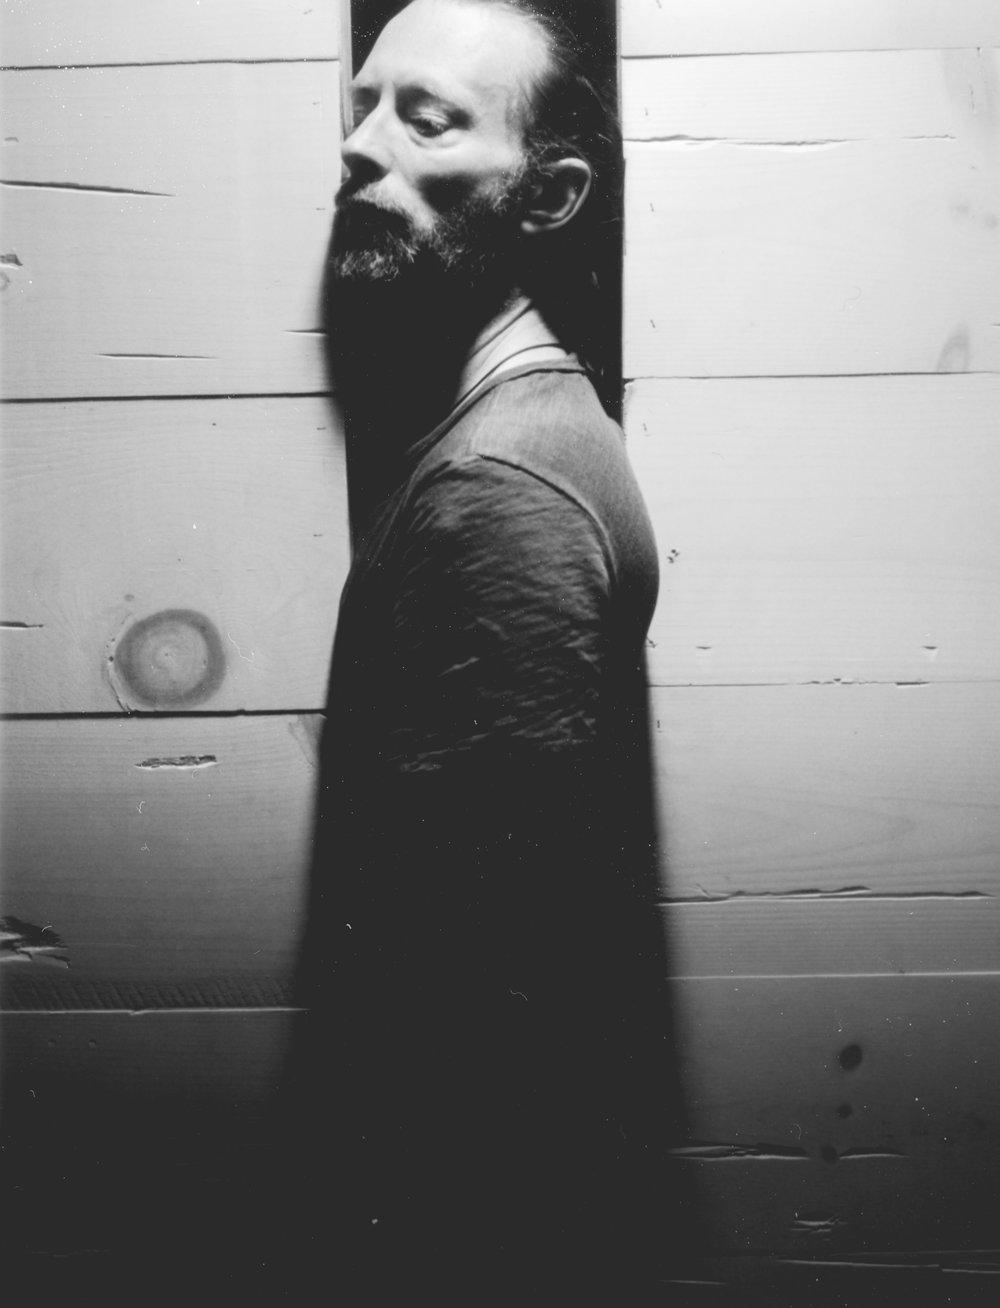 Thom Yorke010_2.jpg